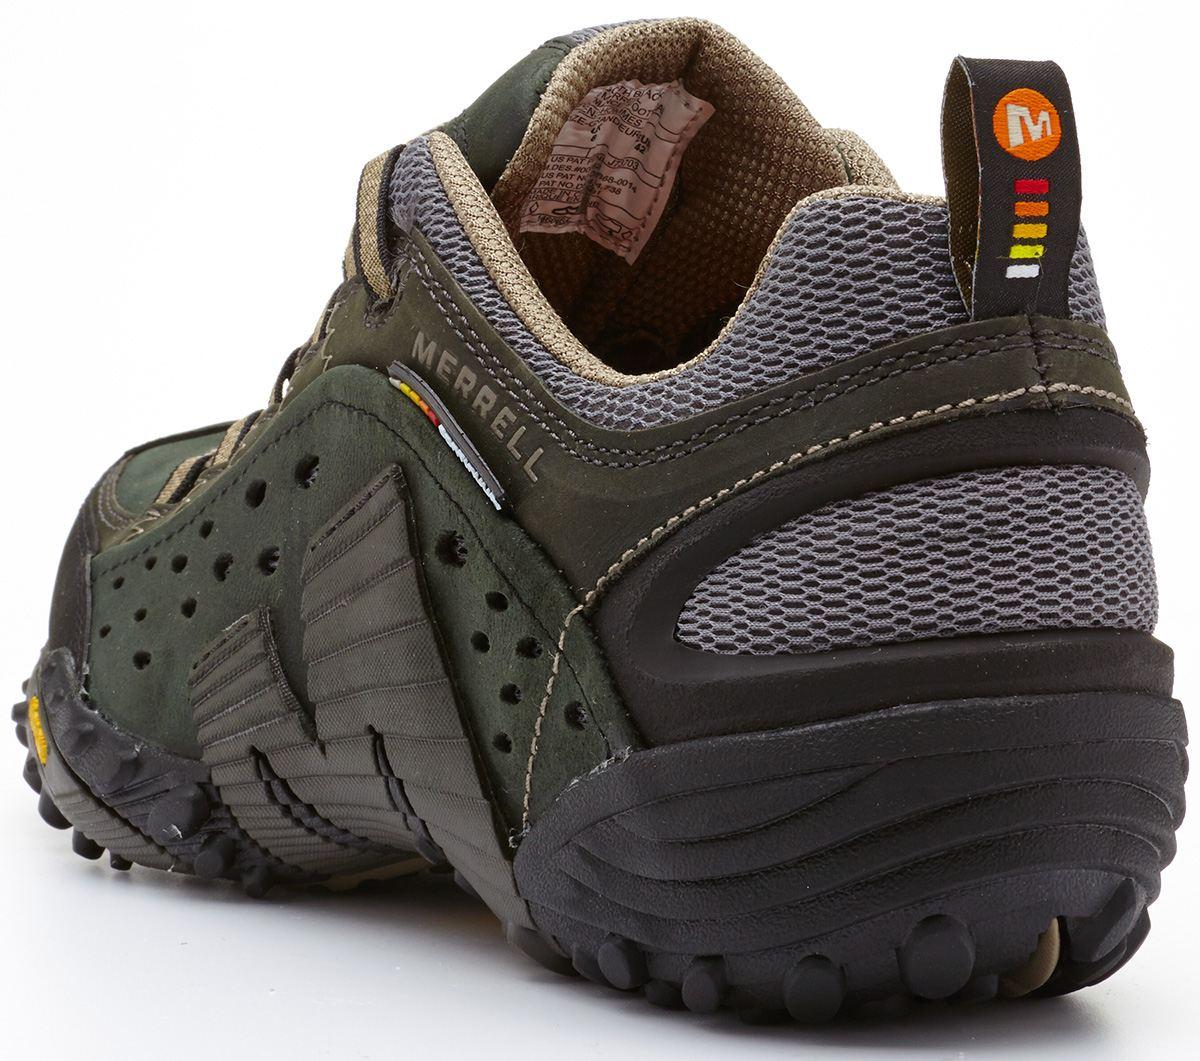 Merrell Shoe Laces Vibram